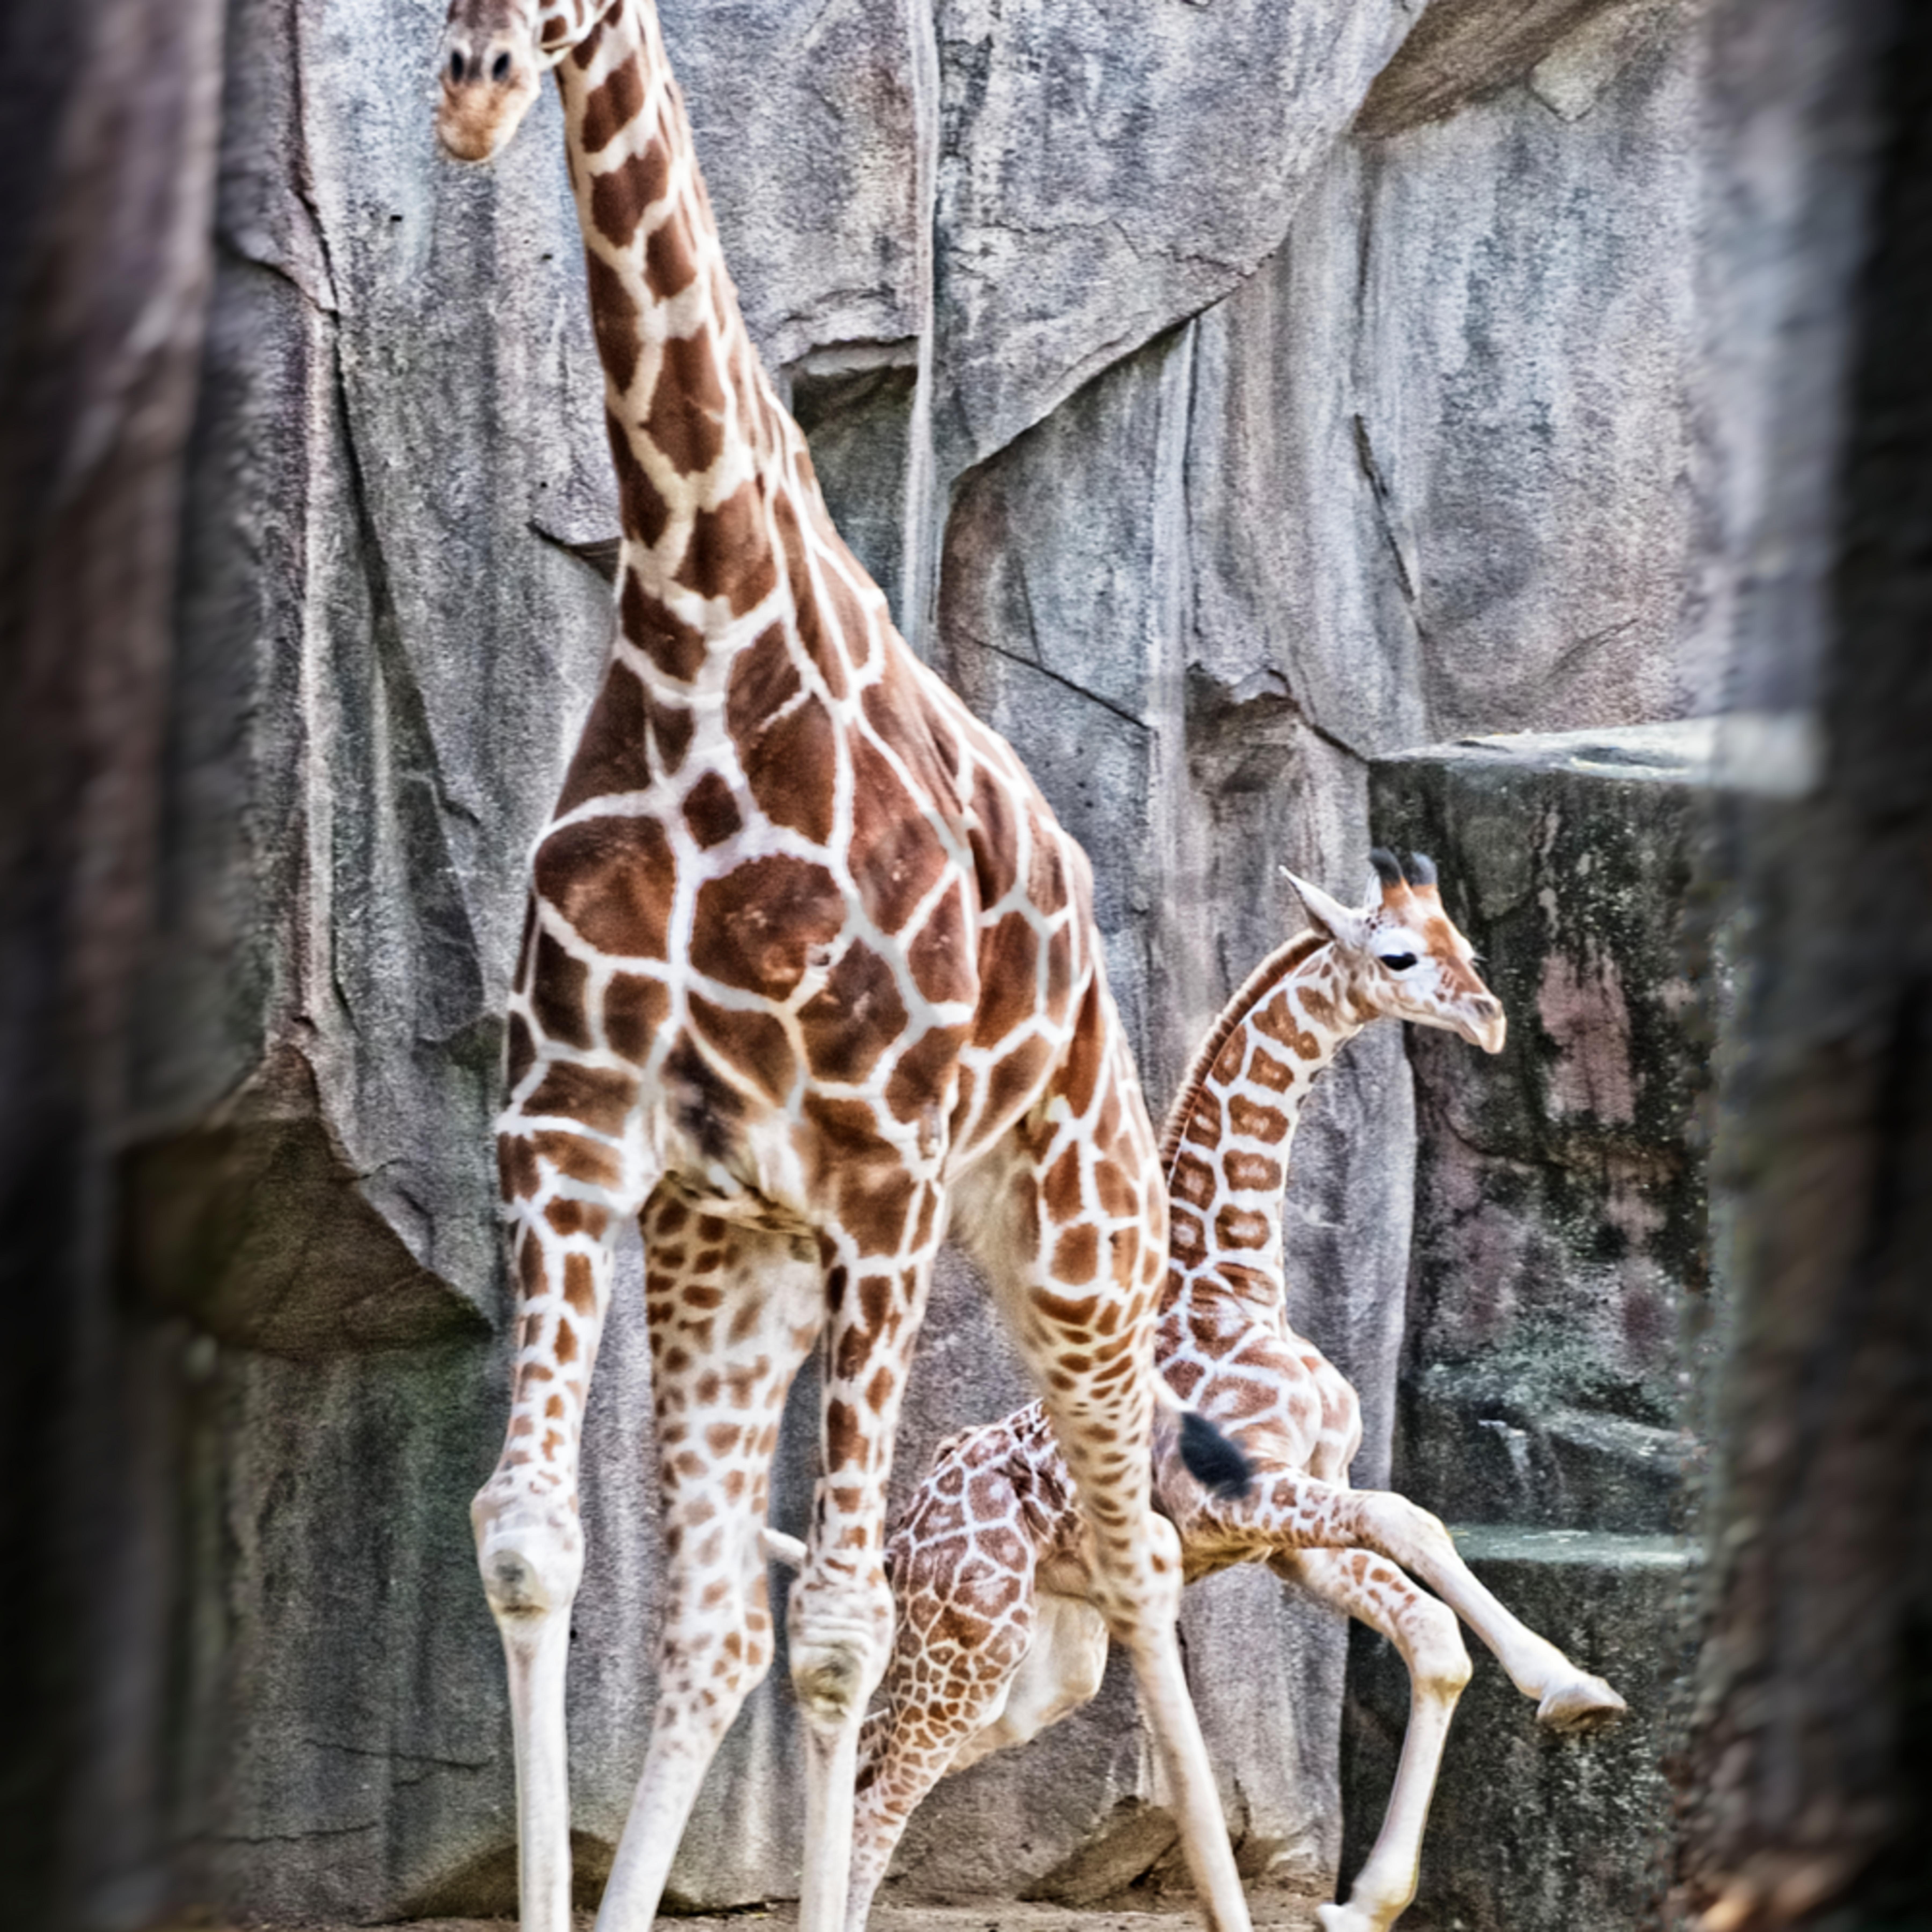 Giraffe play final kmqcls